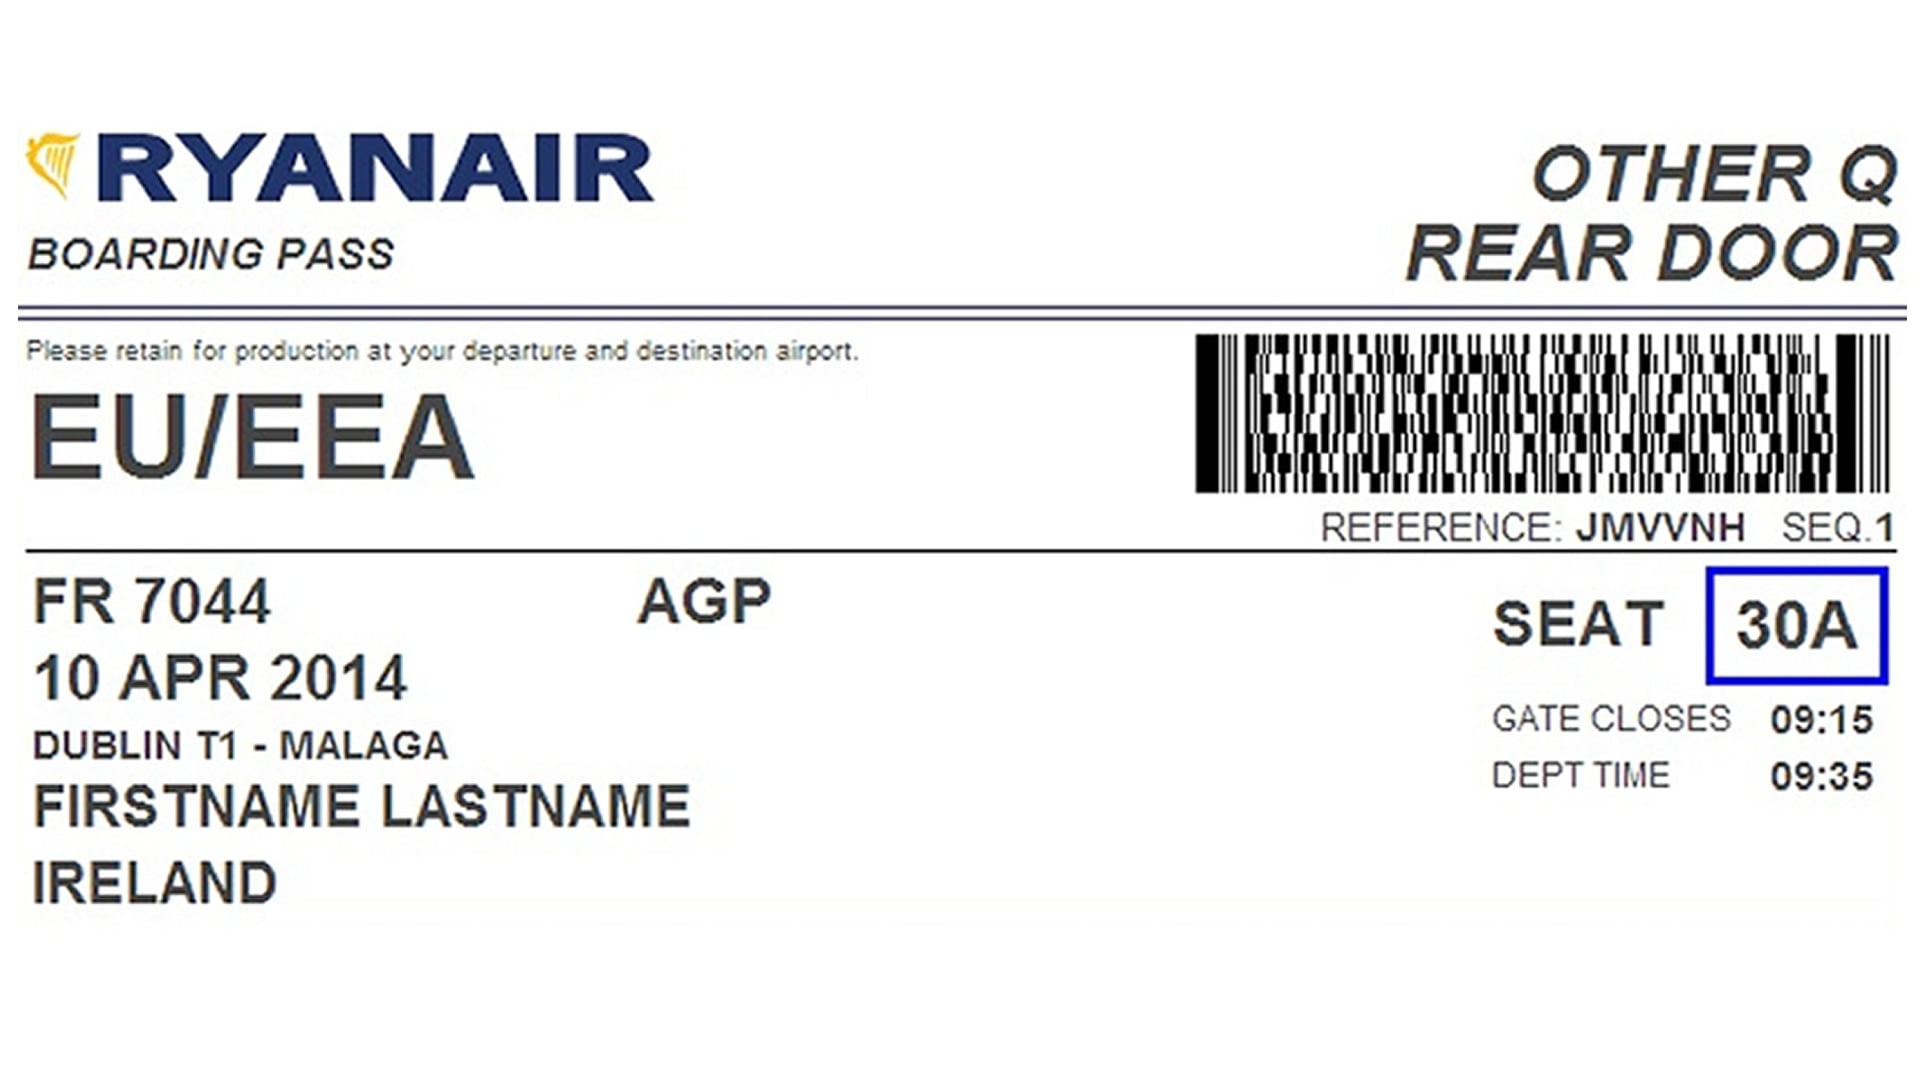 Modelo de tarjeta de embarque online de ryanair for Billetes de avion baratos barcelona paris